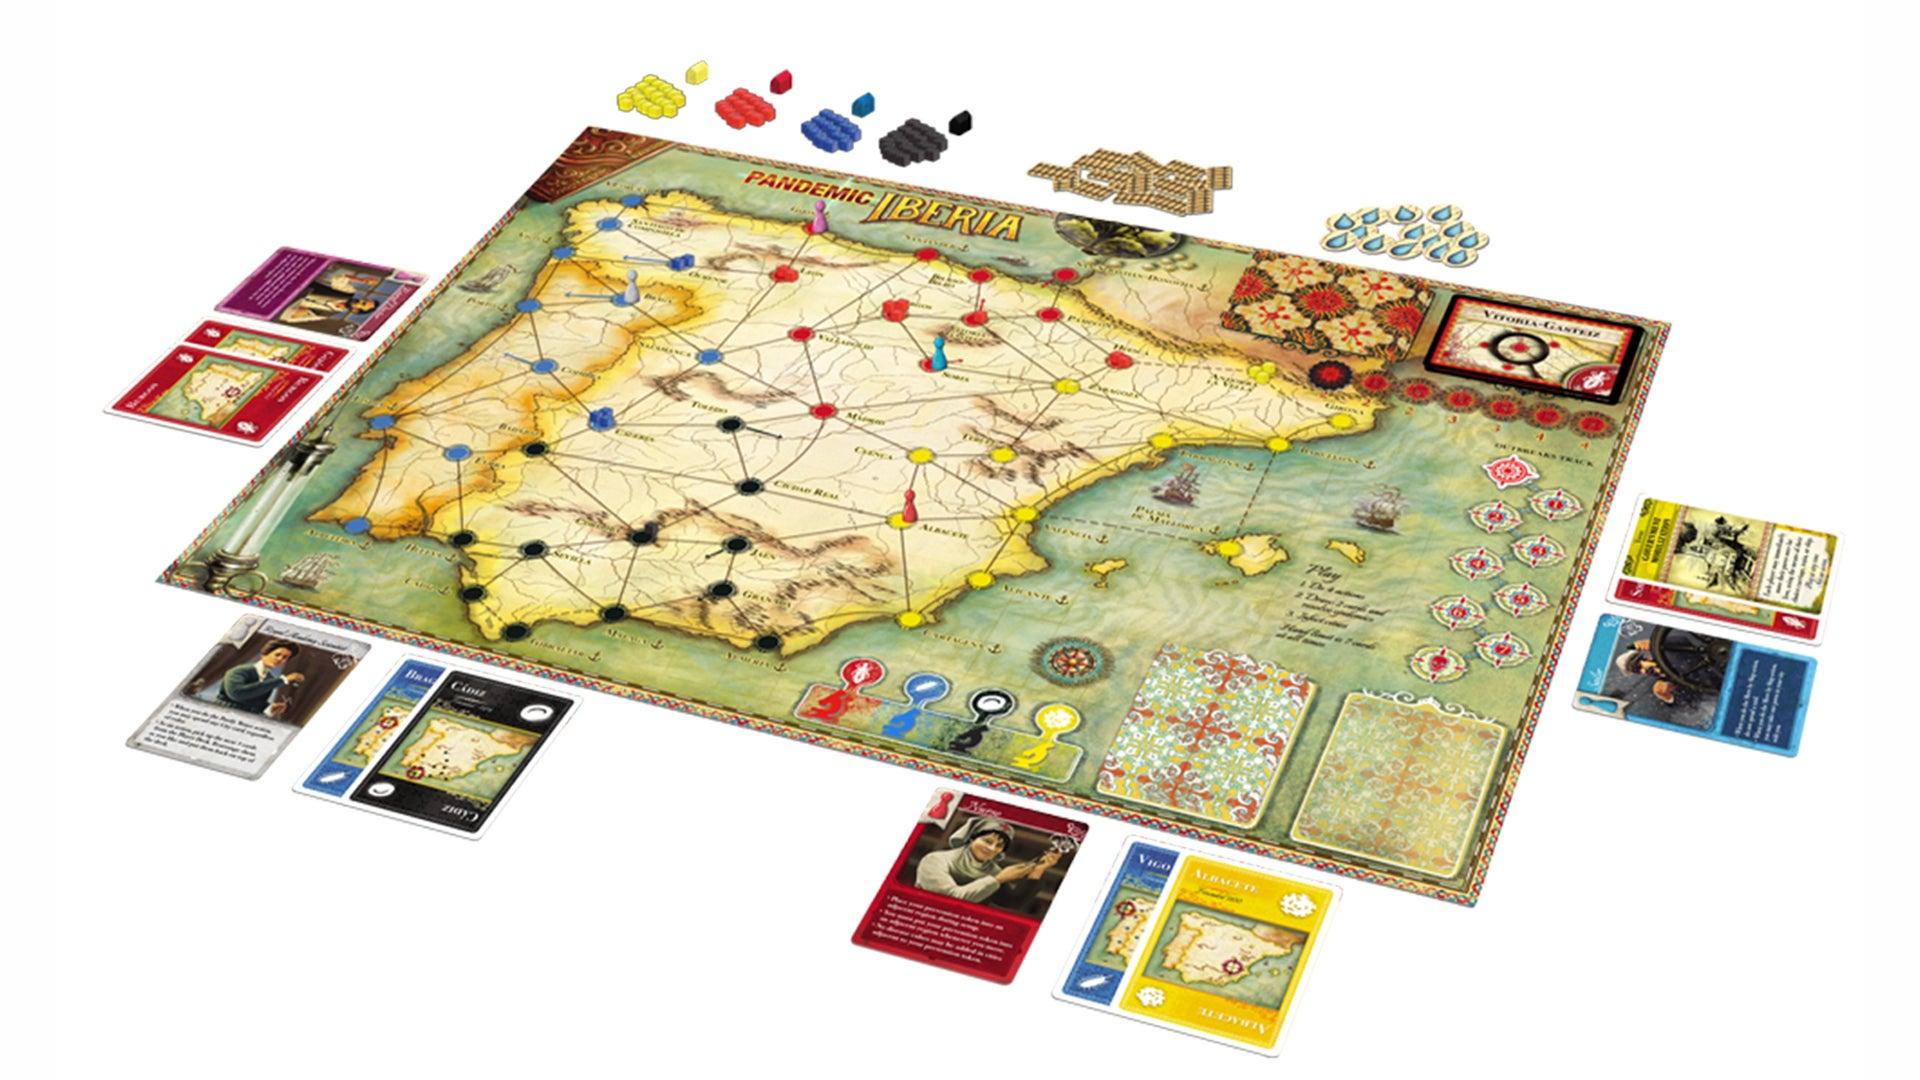 Pandemic Iberia board game layout